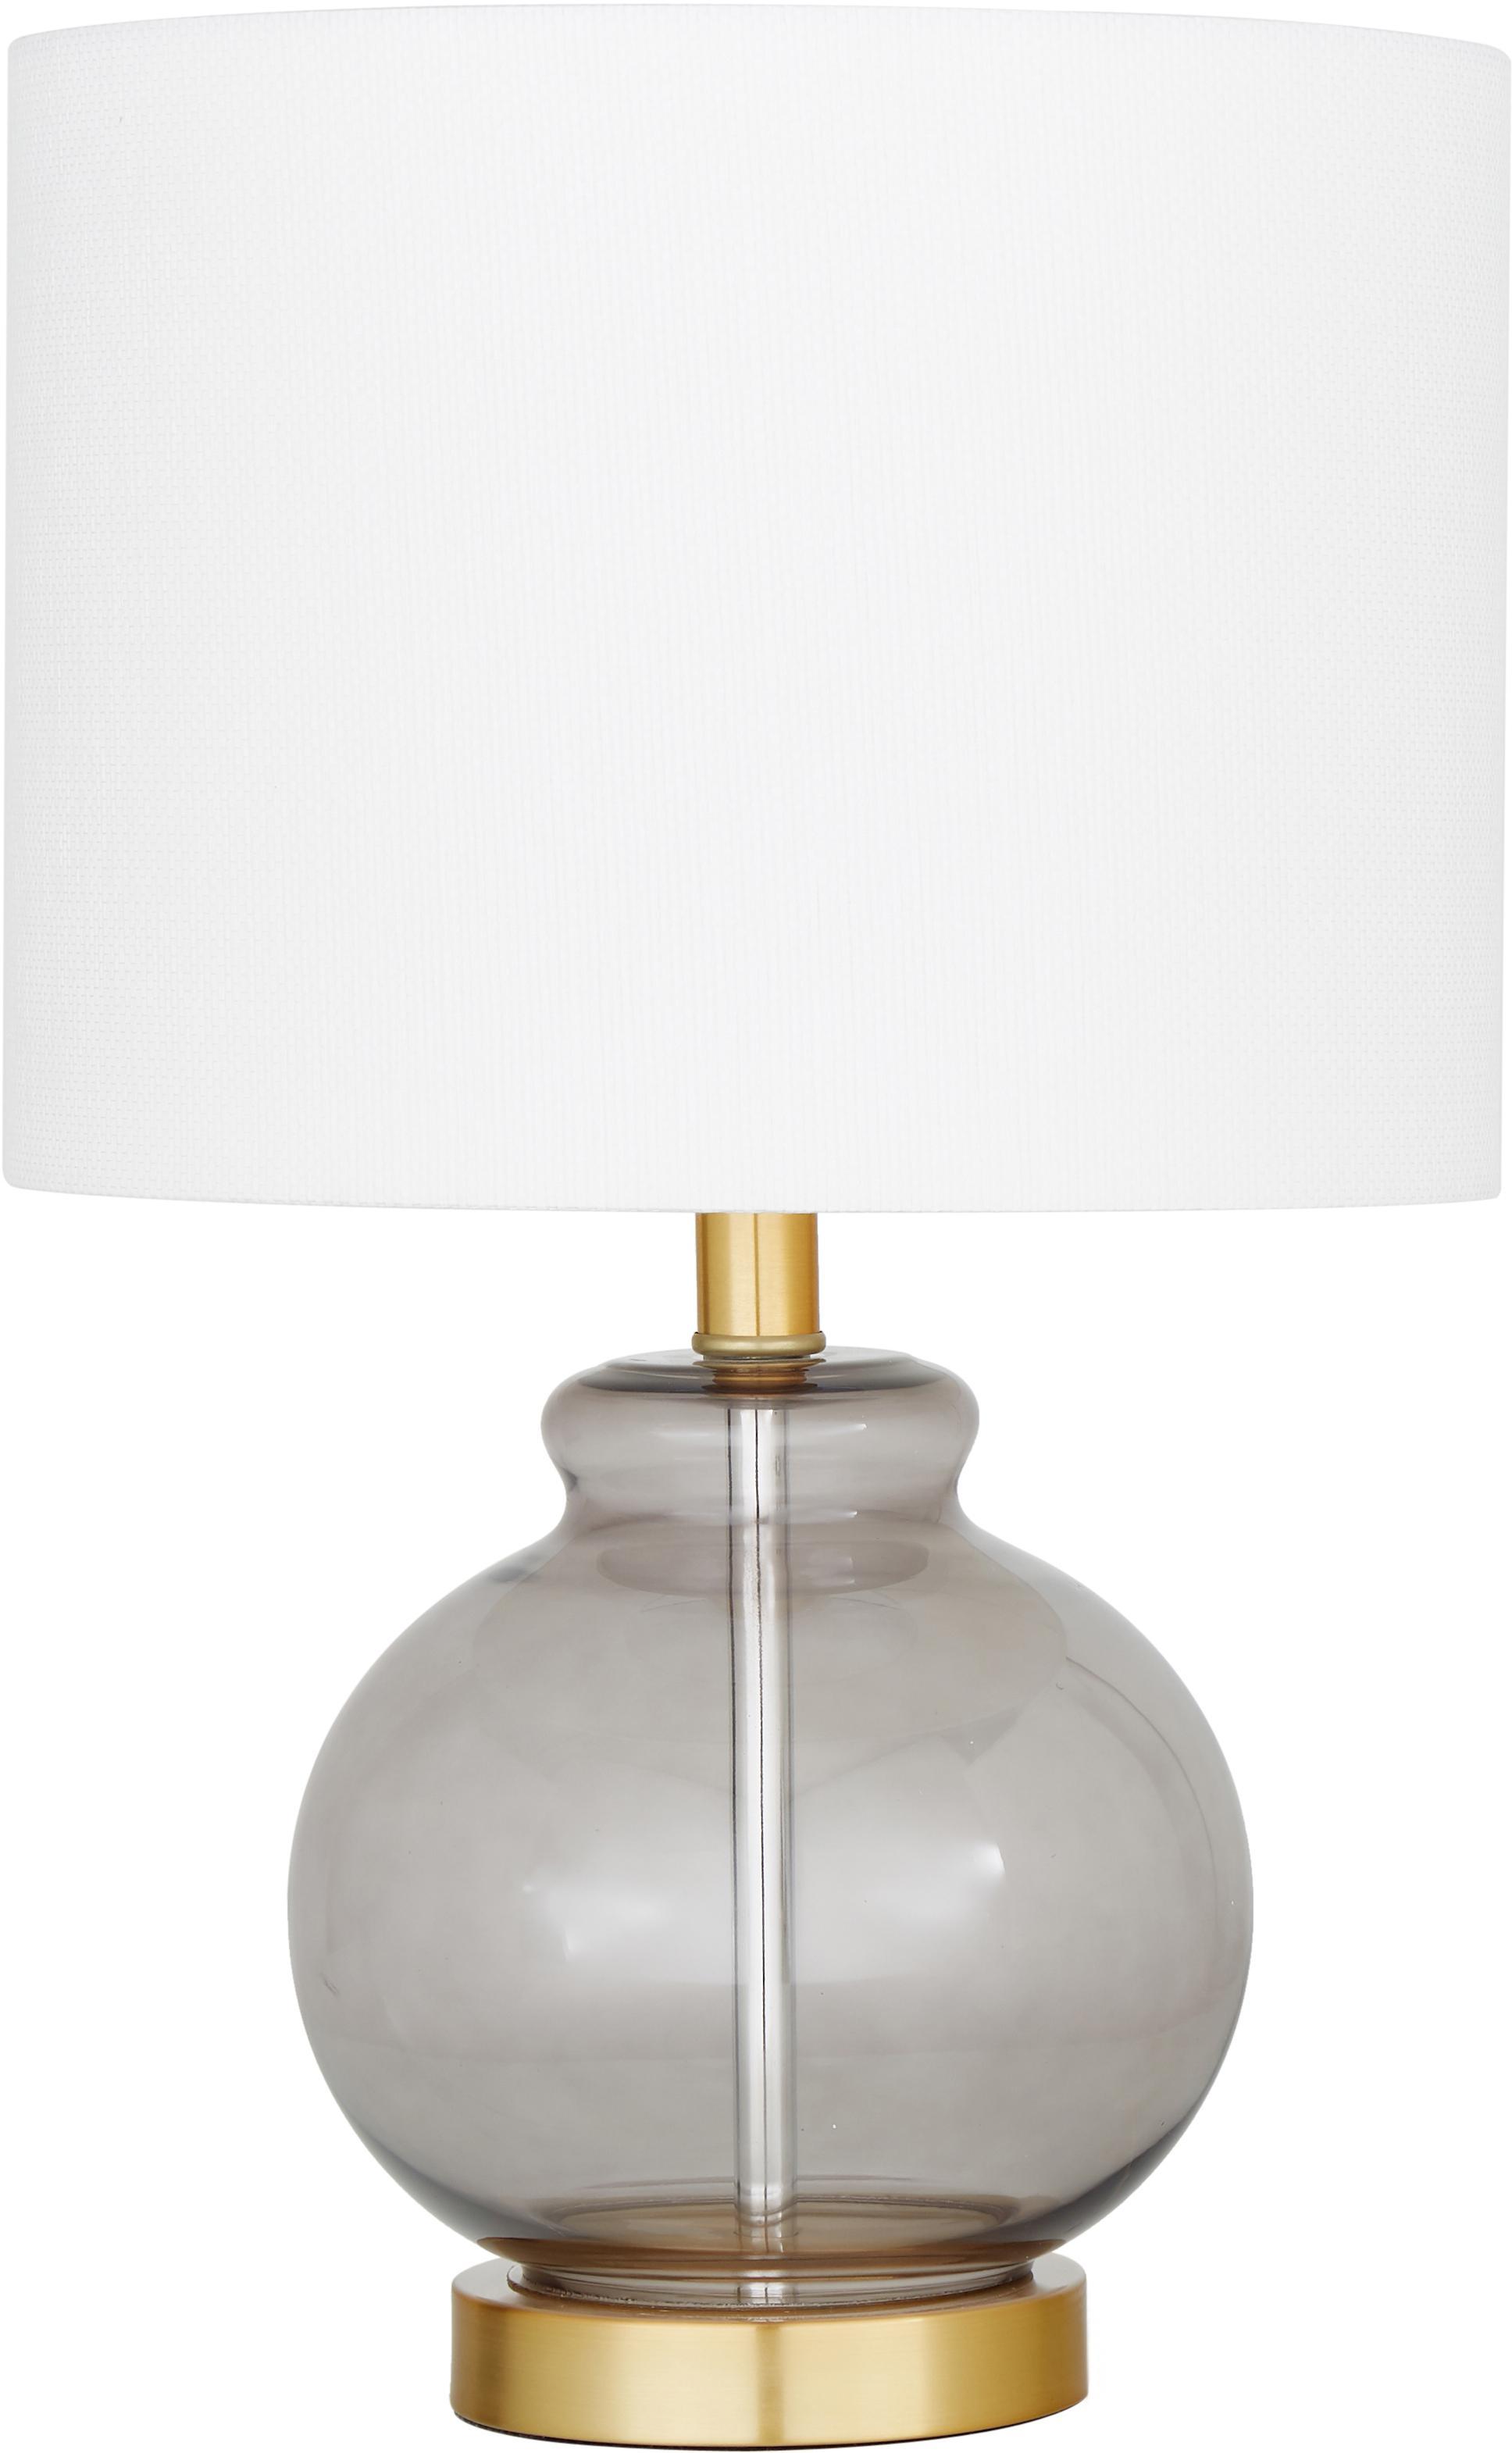 Lámpara de mesa Natty, Pantalla: tela, Cable: plástico, Blanco, gris azulado, transparente, Ø 31 x Al 48 cm